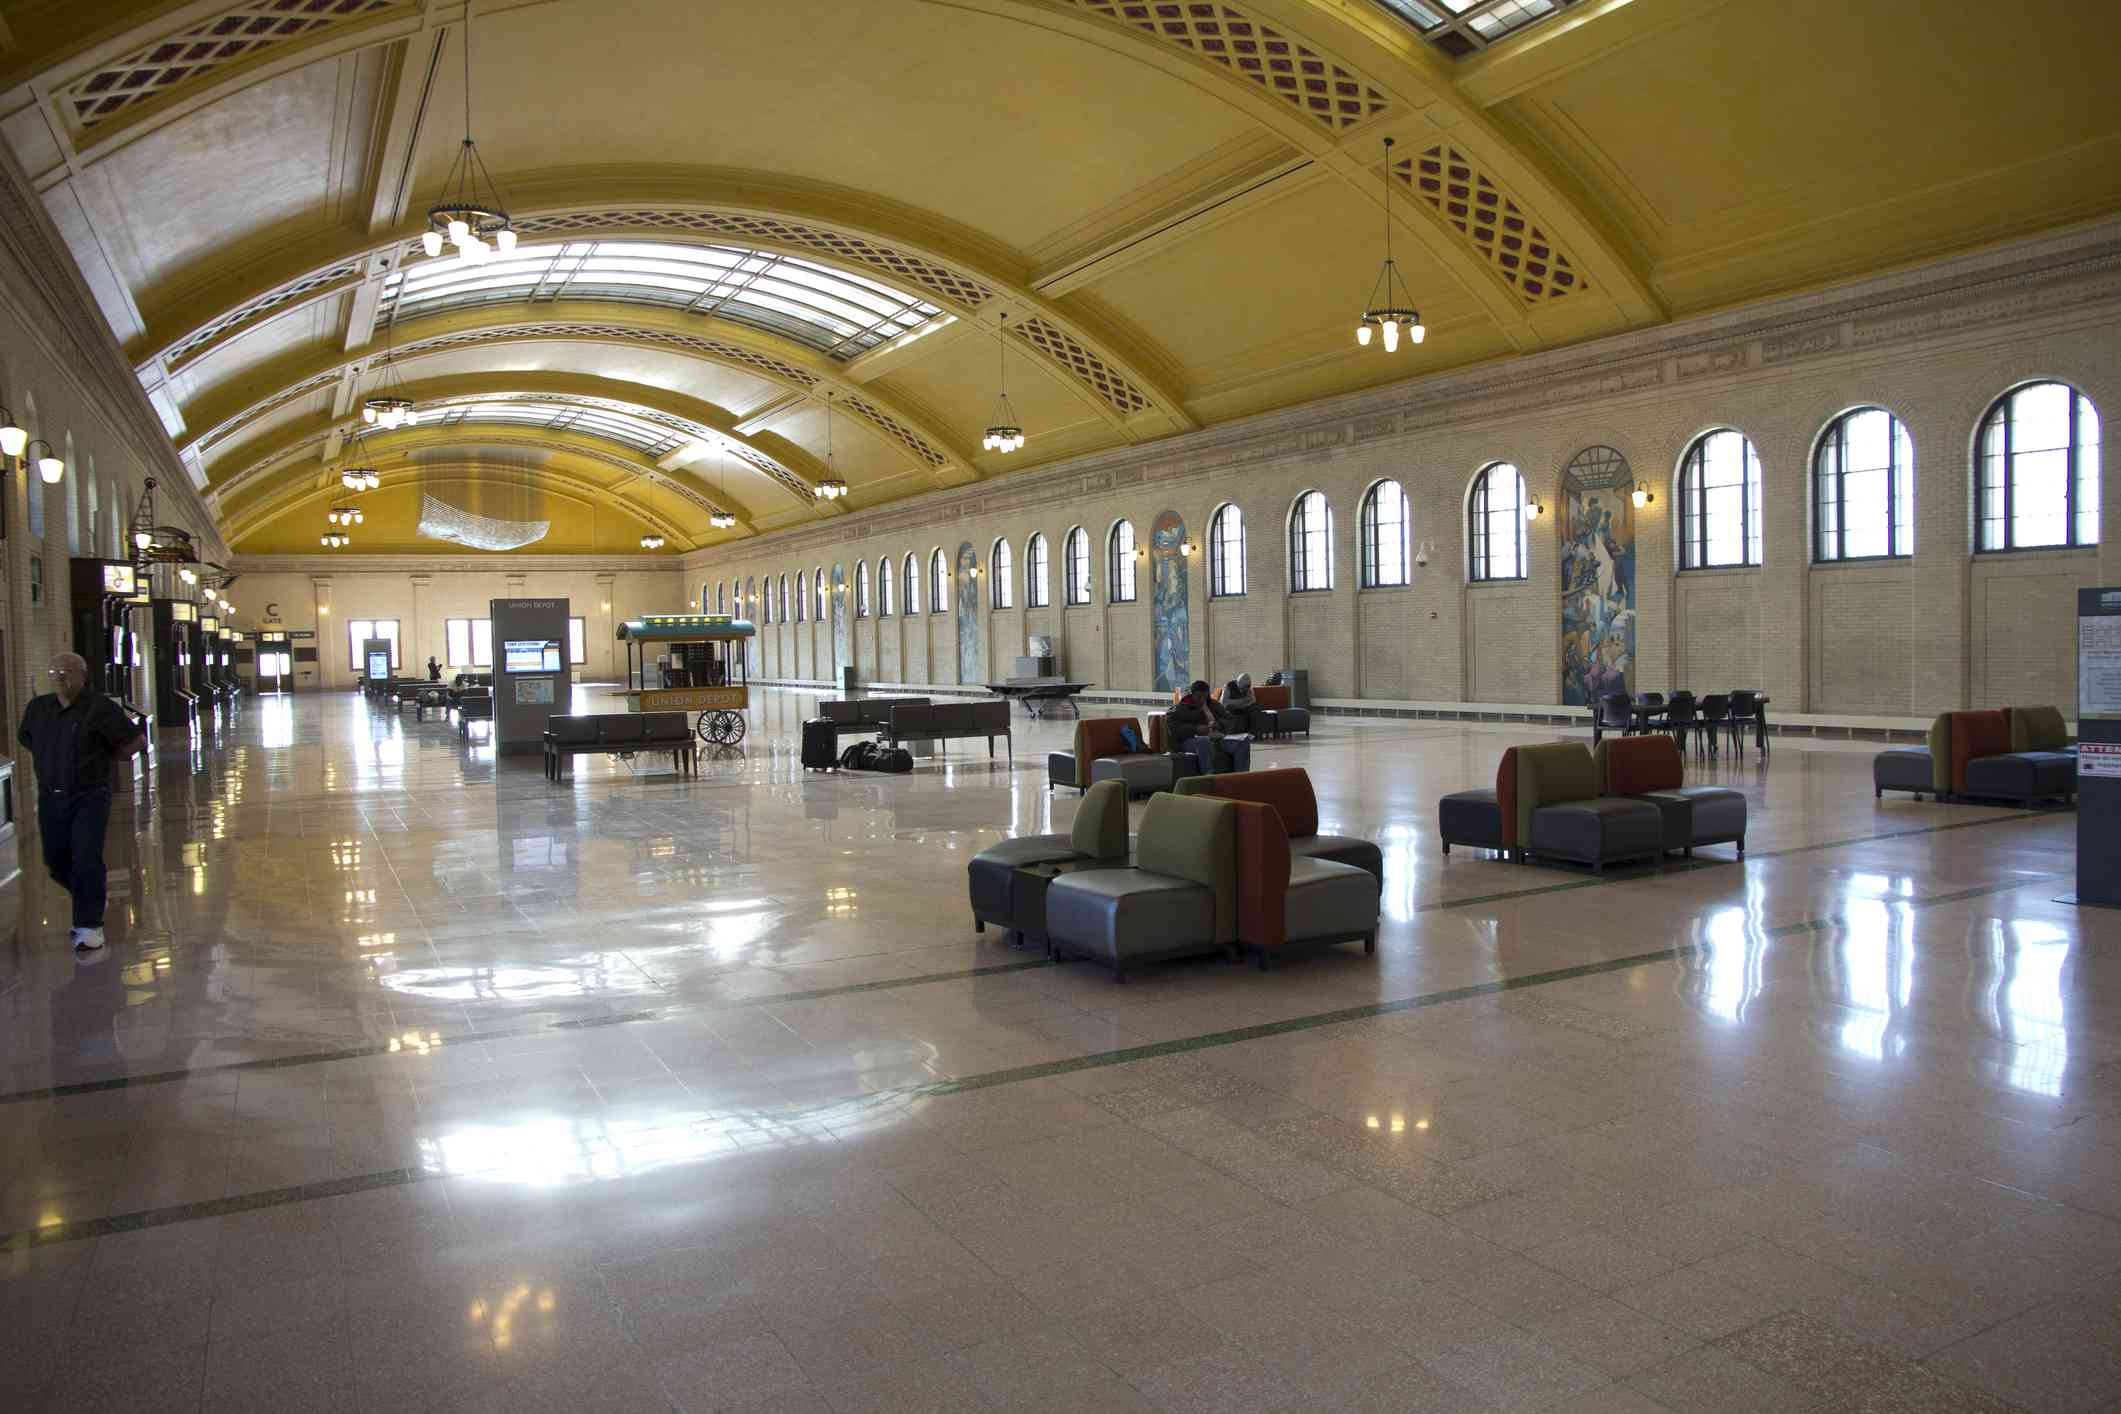 Union Depot interior, Saint Paul, MN